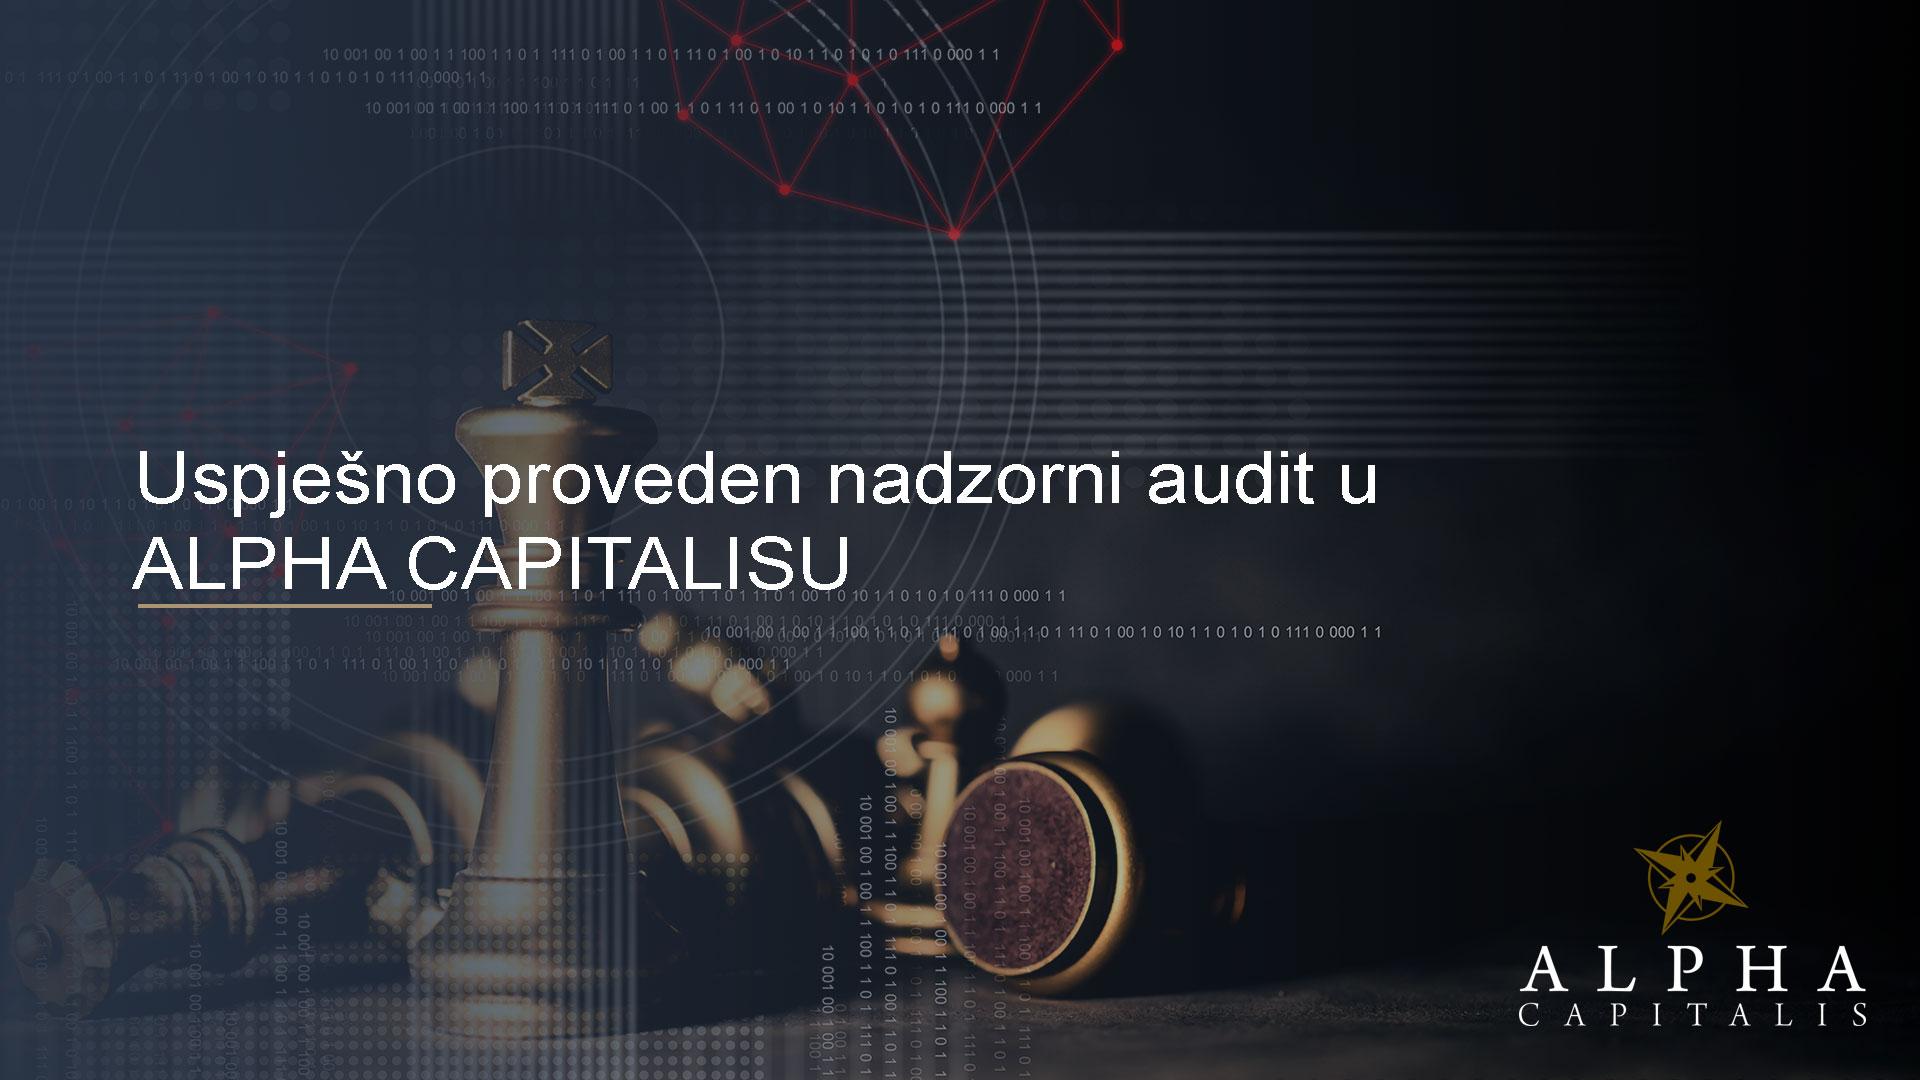 Alpha-capitalis-novosti_nadzorni-audit-iso